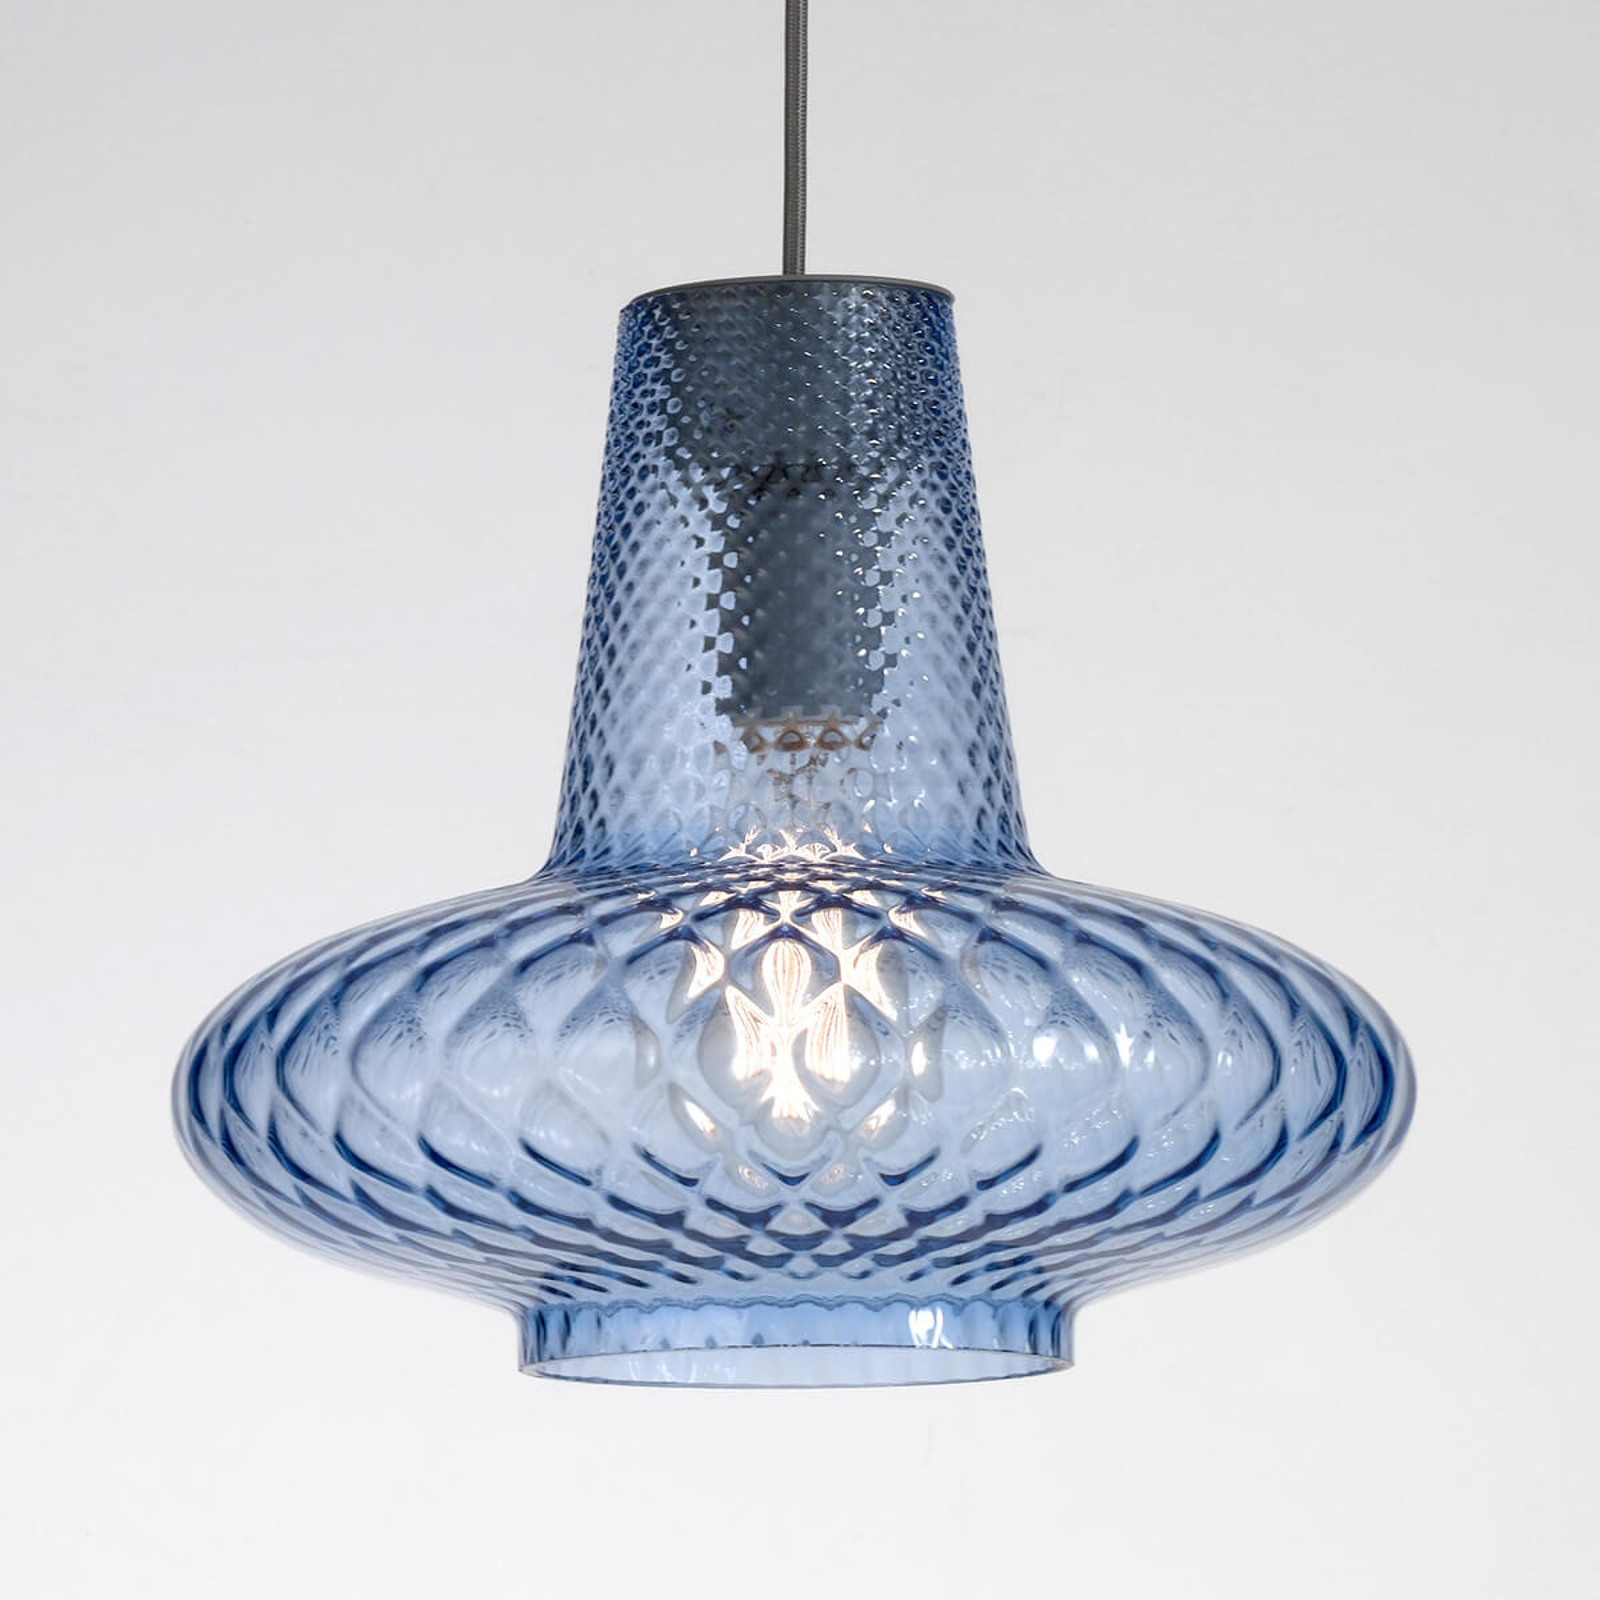 Szklana lampa wisząca Giulietta, niebieska